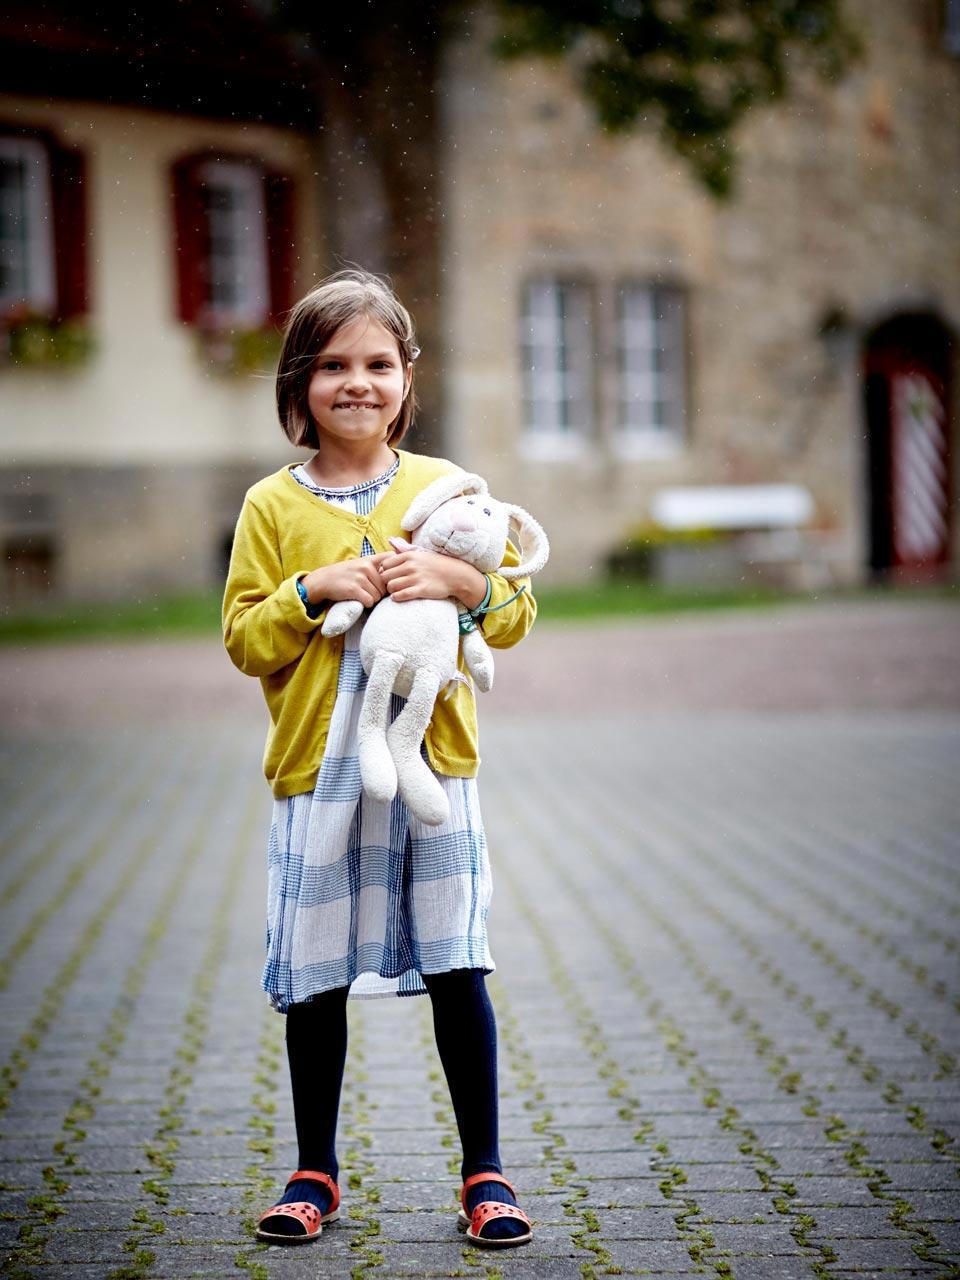 MJ_274_Mainz-Familienfotos-Heurich-